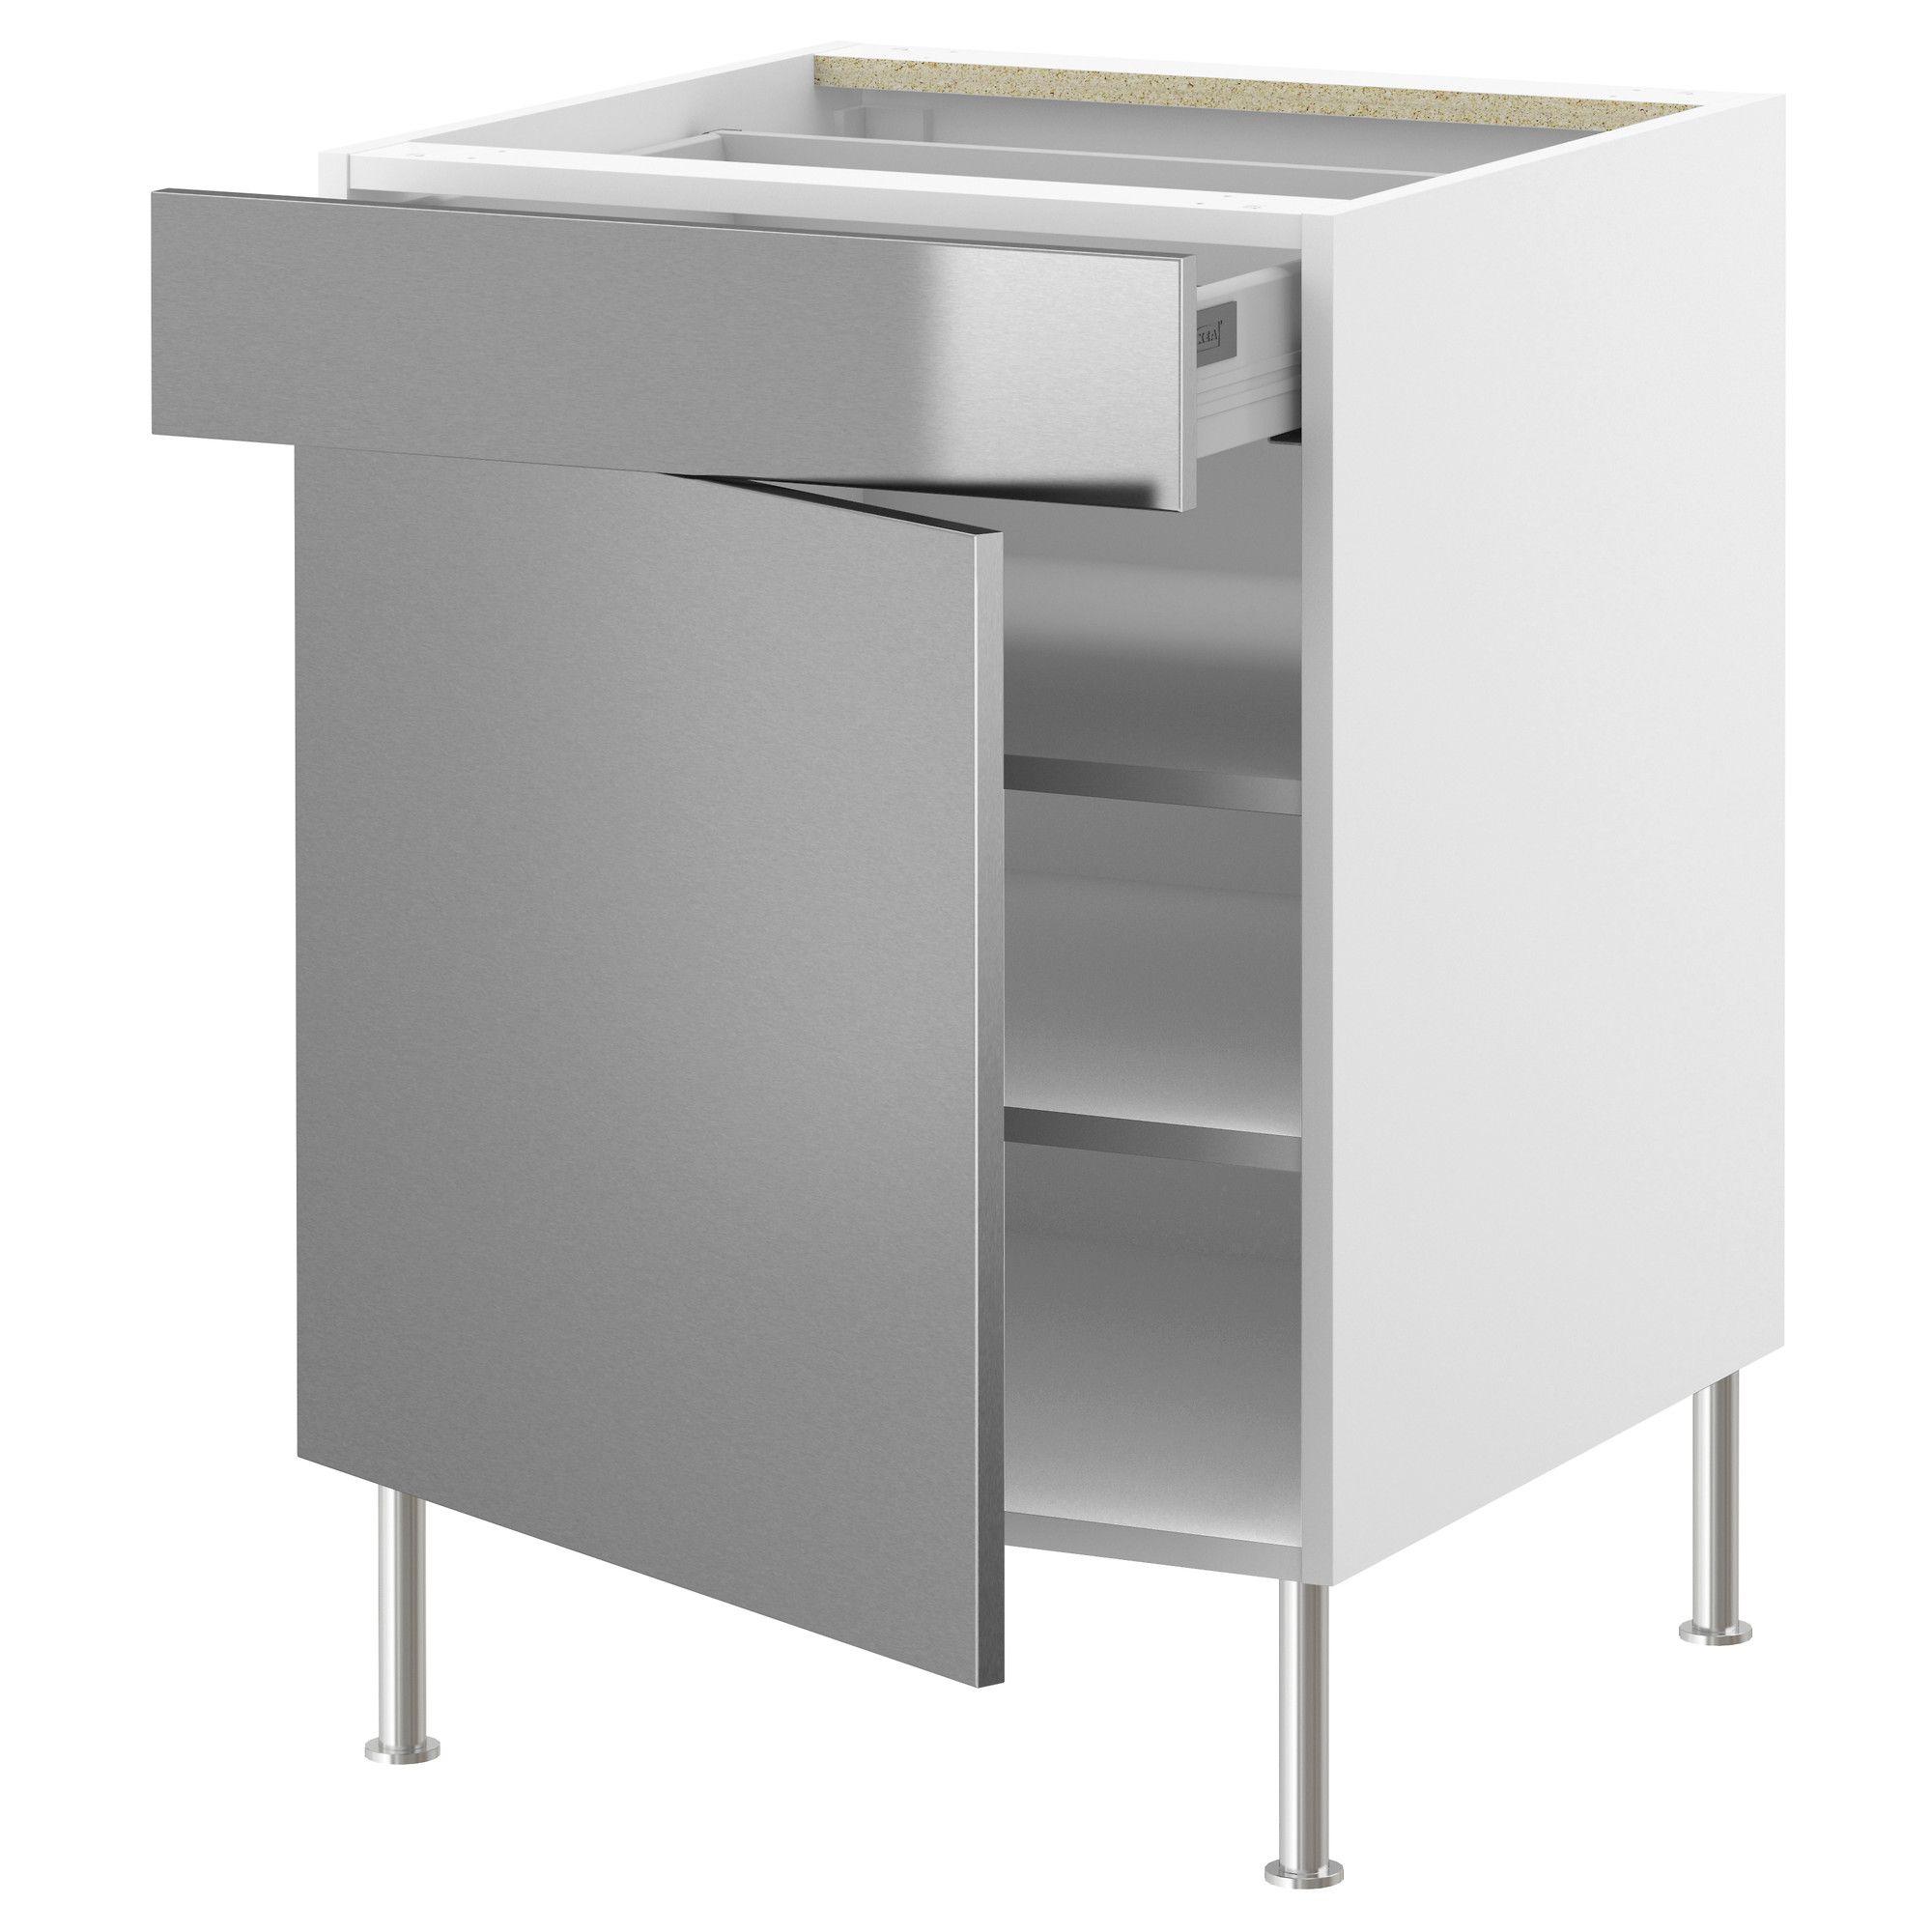 Küche Ikea Edelstahl. Ayurvedische Küche Rezepte Ikea Metod Grifflos ...